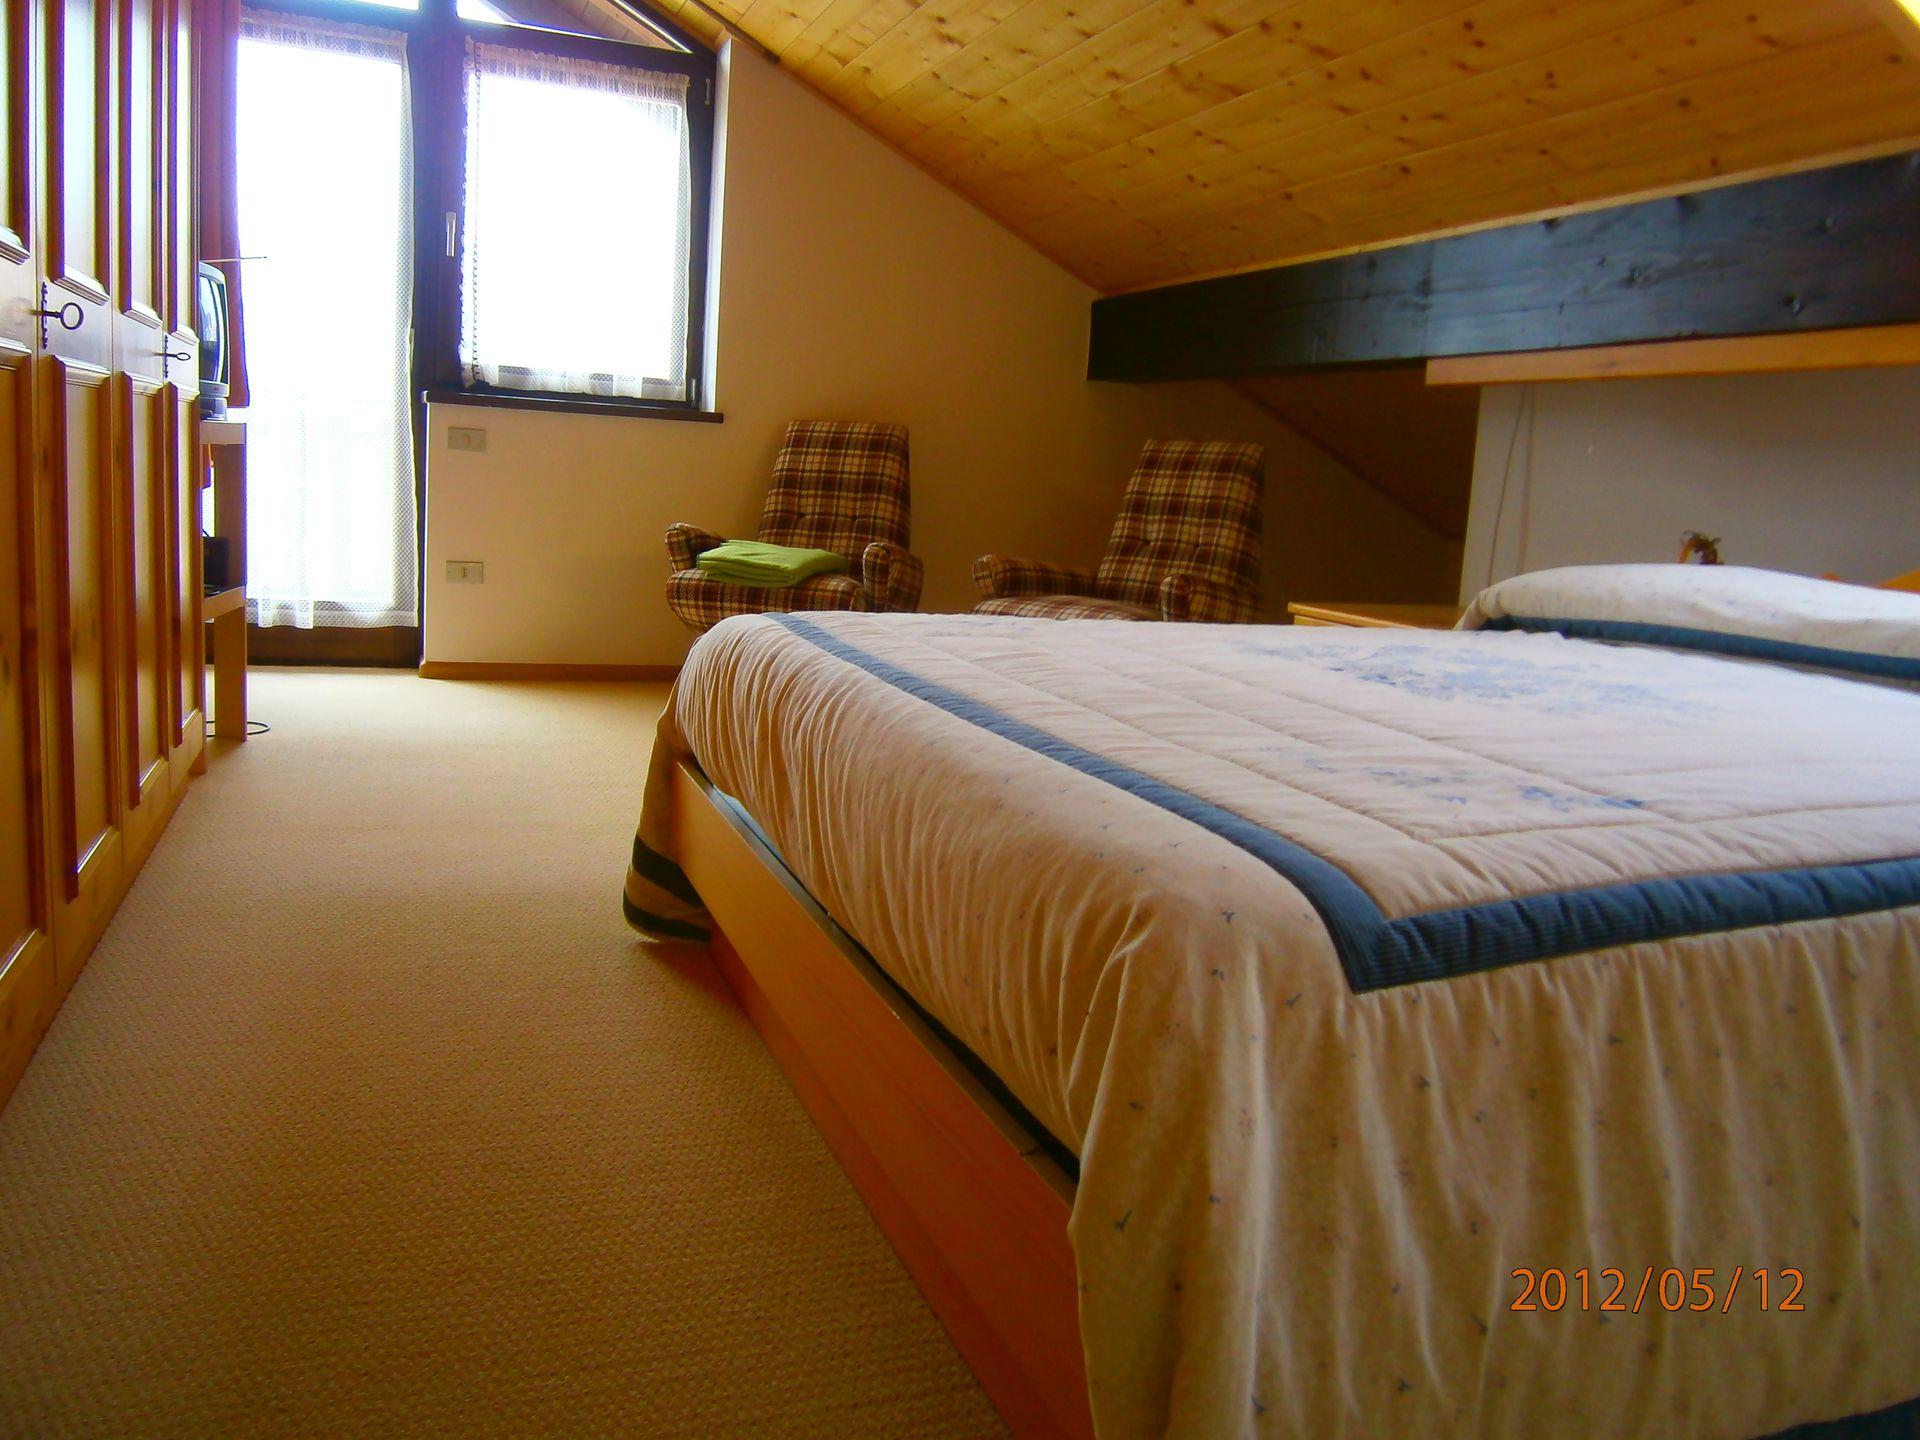 affitto appartamento montagna carano 7998 (20120926190902-2012-47599-NDP.jpg)